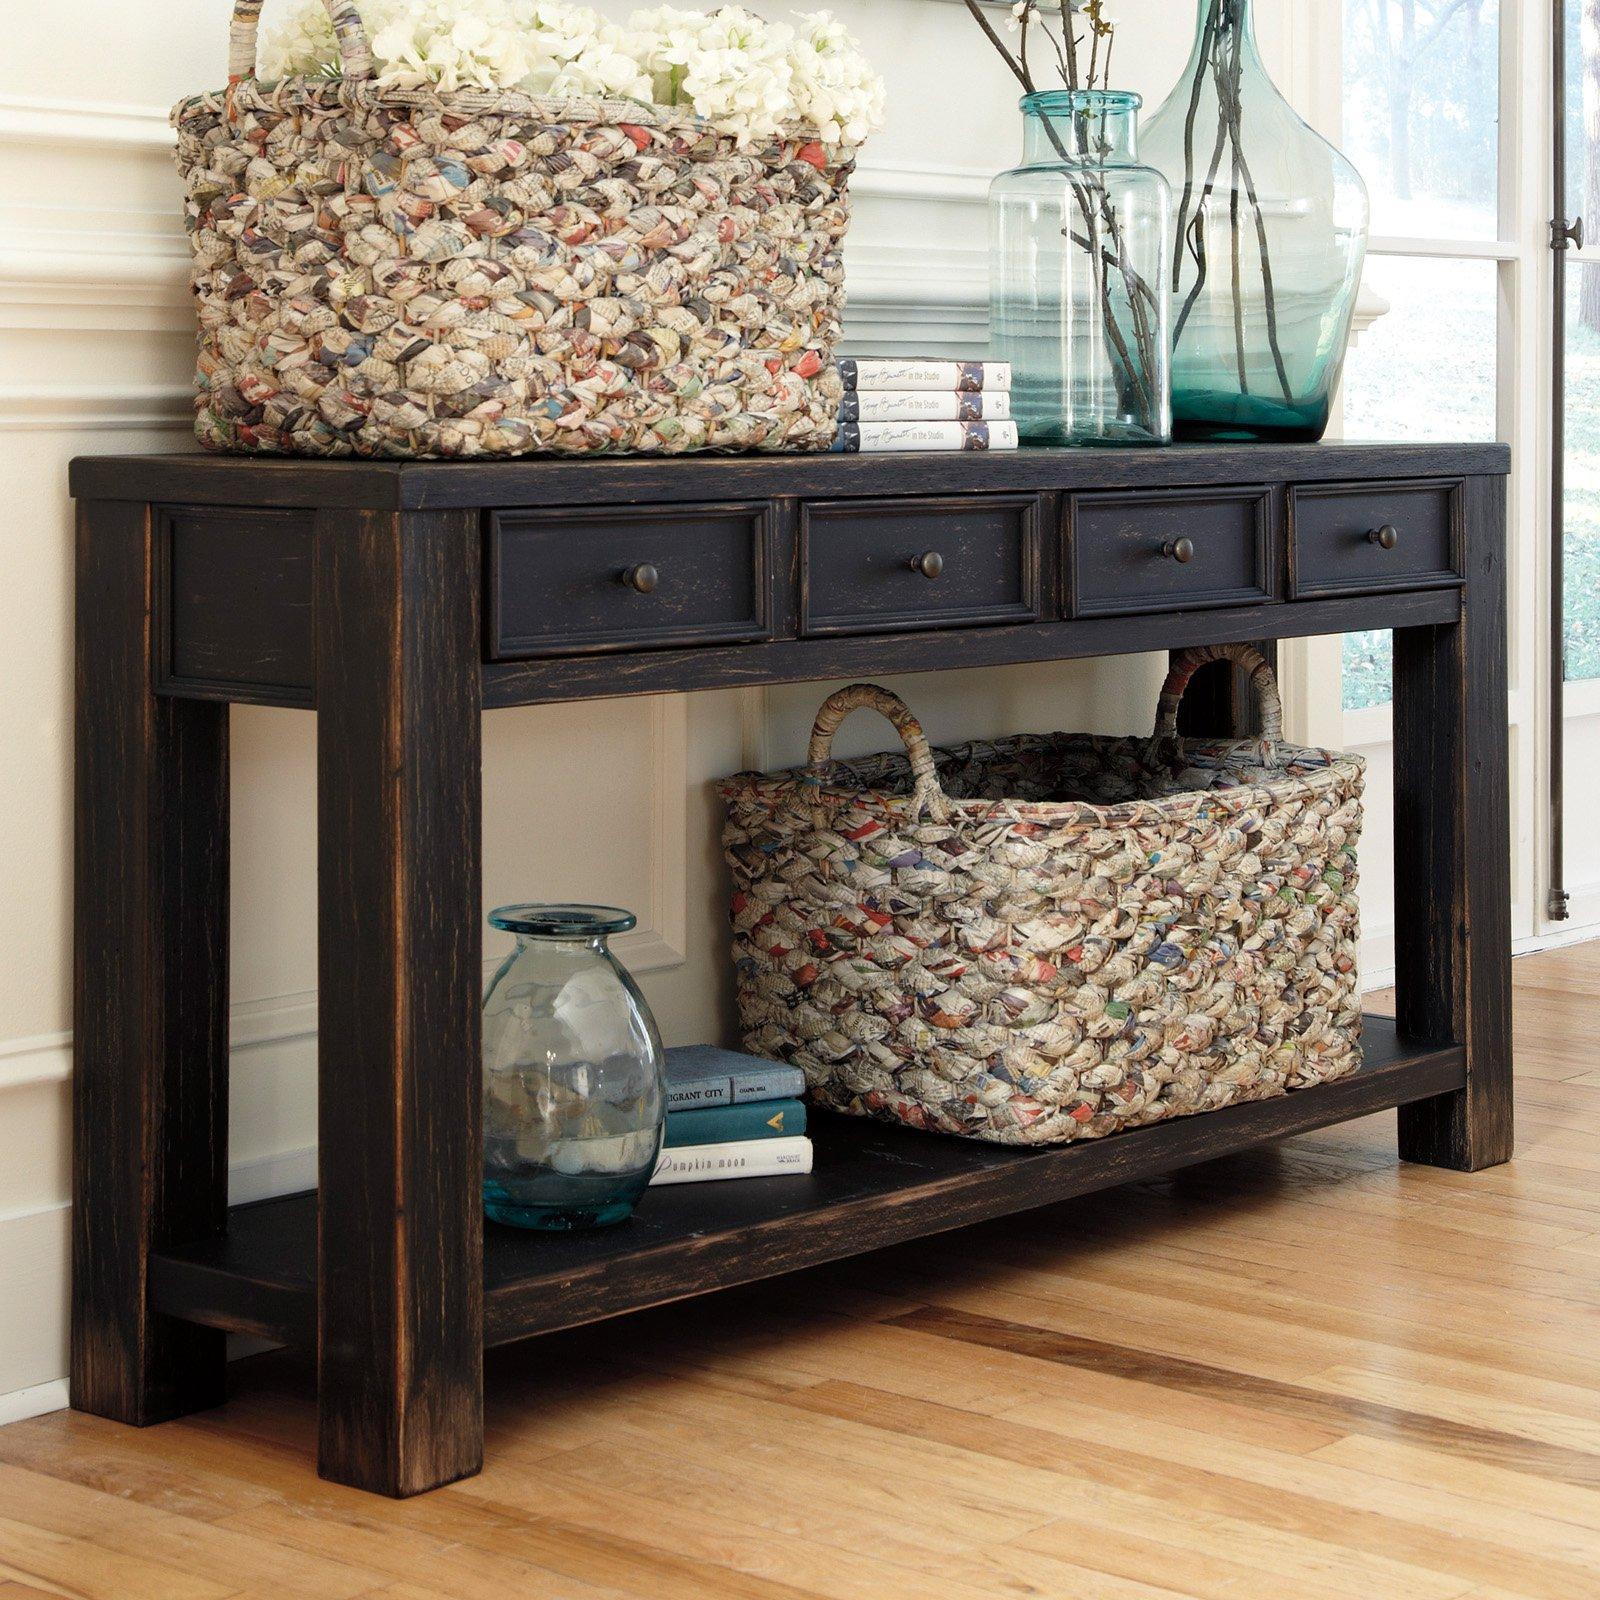 signature design by ashley gavelston rectangular black sofa table -  walmart.com CBYNAJG